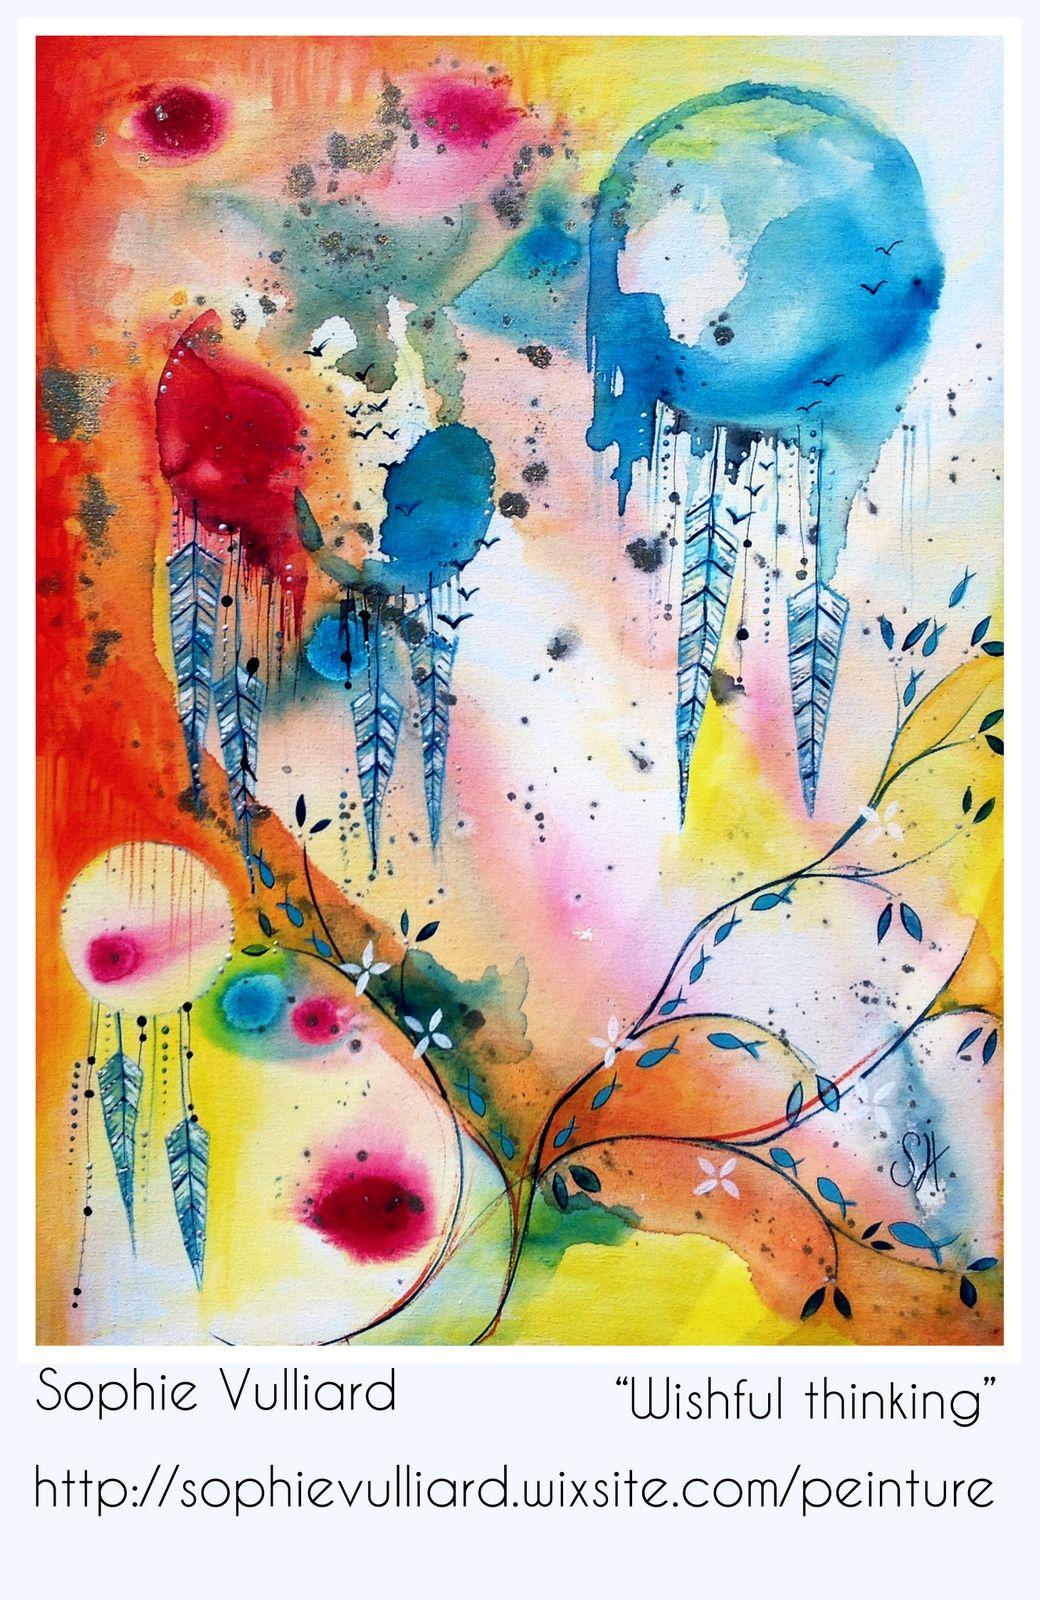 Sophie Vulliard Intuitive Painting Peinture Intuitive Peinture